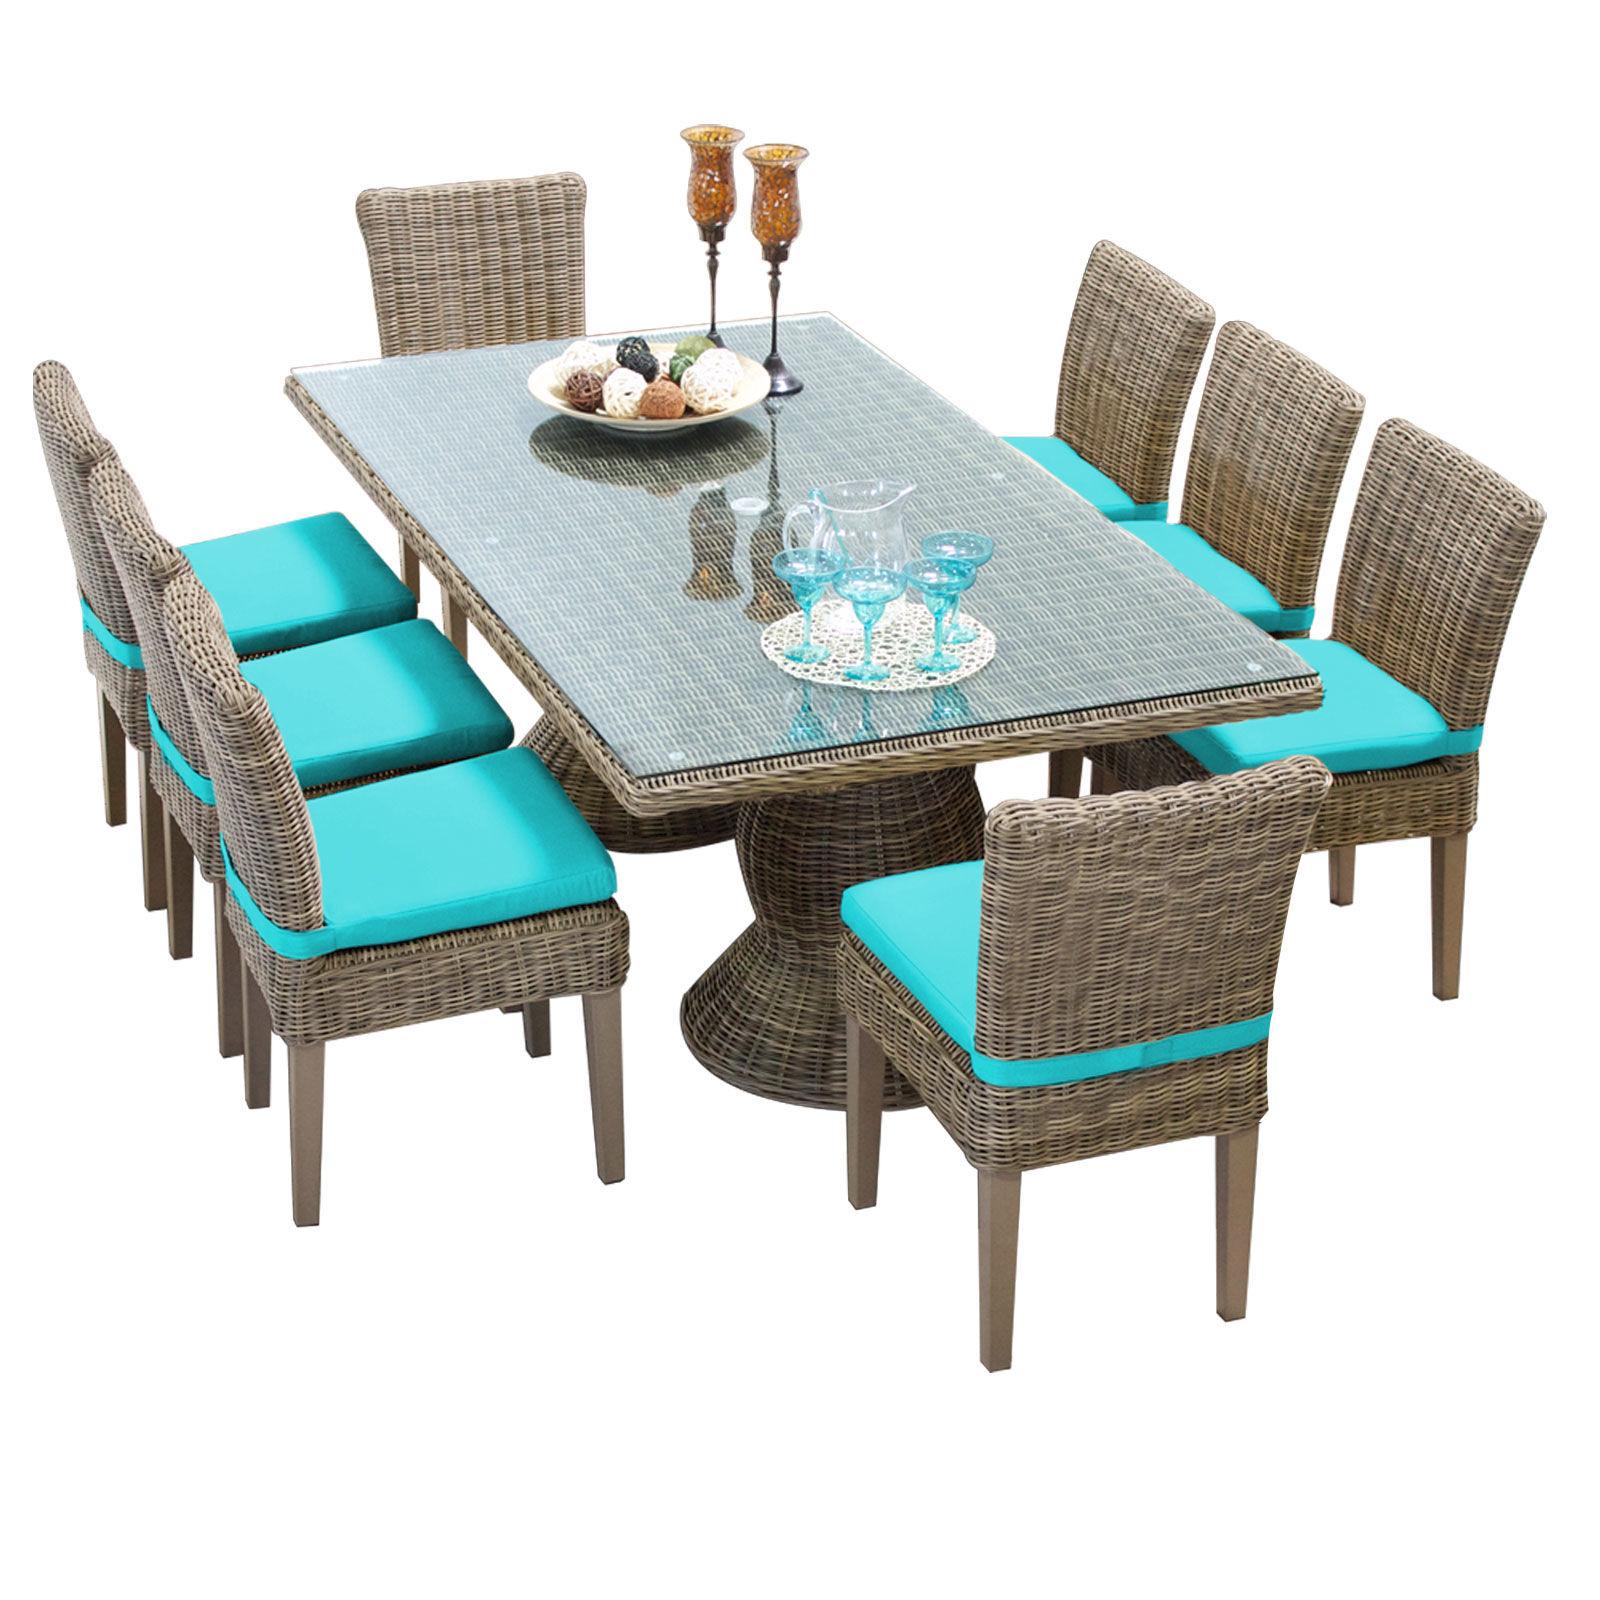 Miseno Sets Outdoor Furniture - MPF-CPCDRECTKIT8C